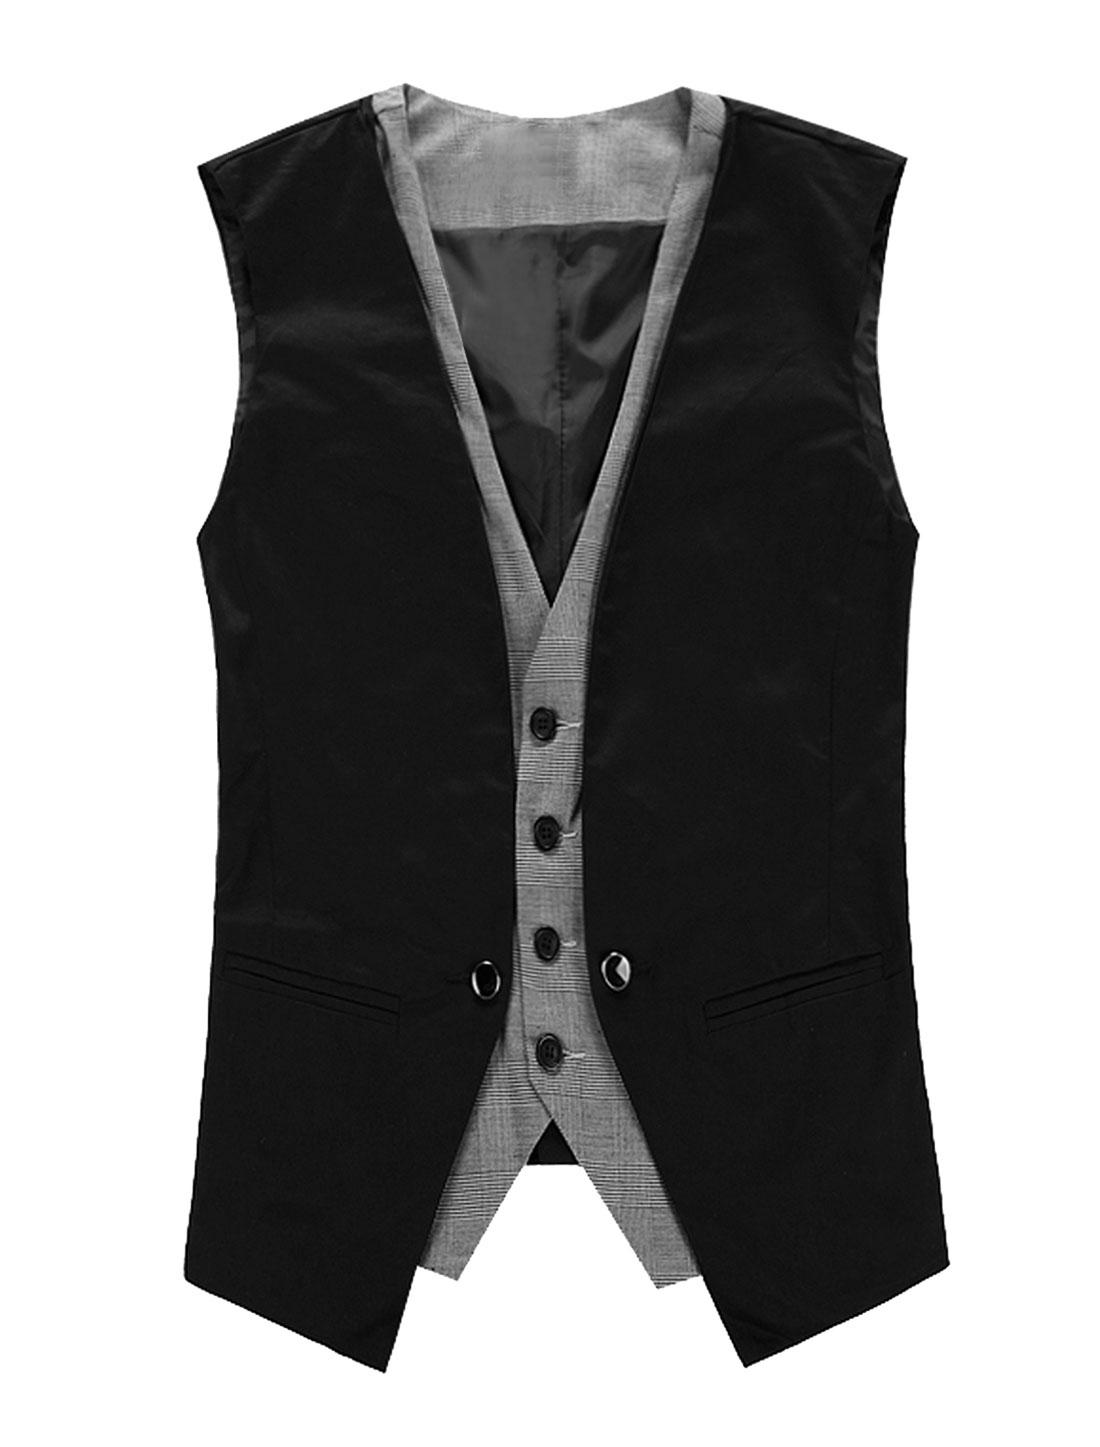 Men V Neck Sleeveless Plaid Button Down Closure Layered Waistcoat Vest Black S